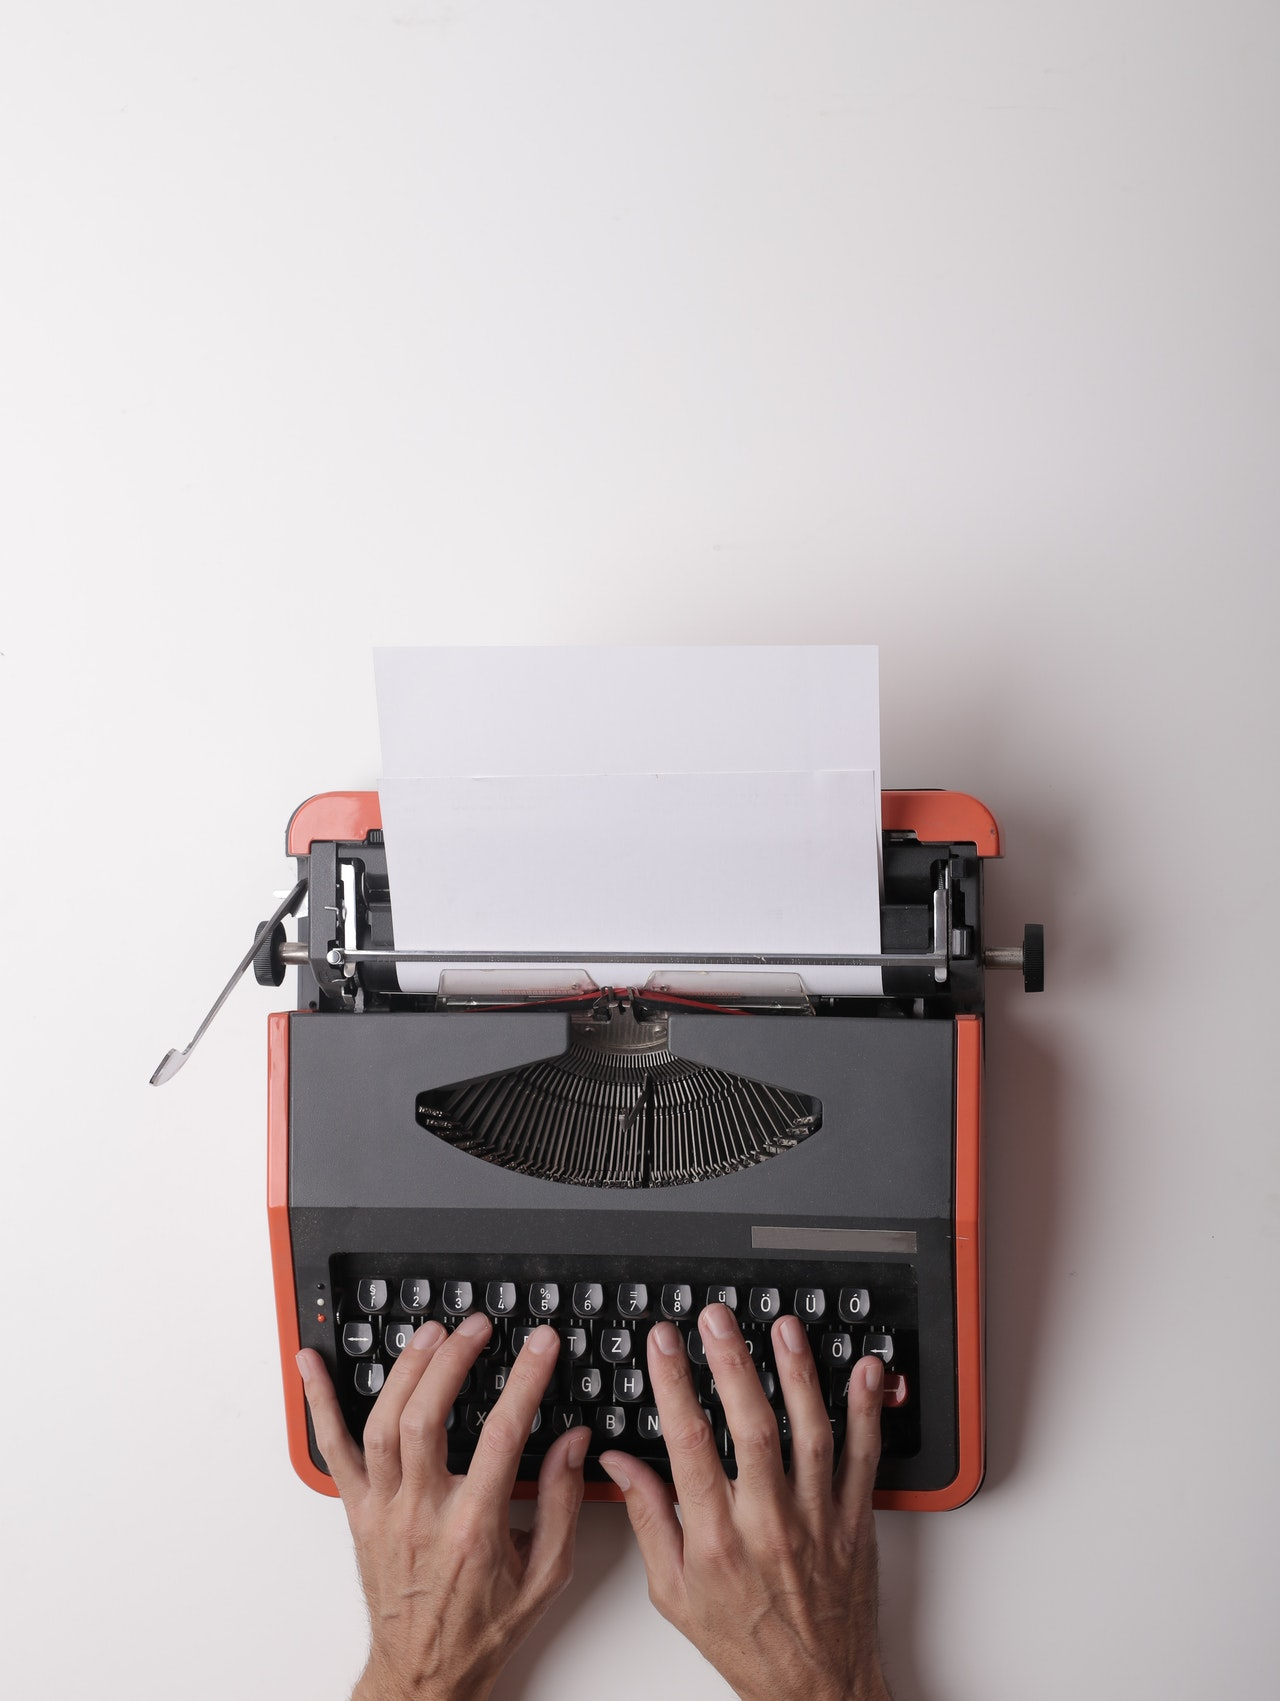 hands drafting ad copy on a bright orange typewriter